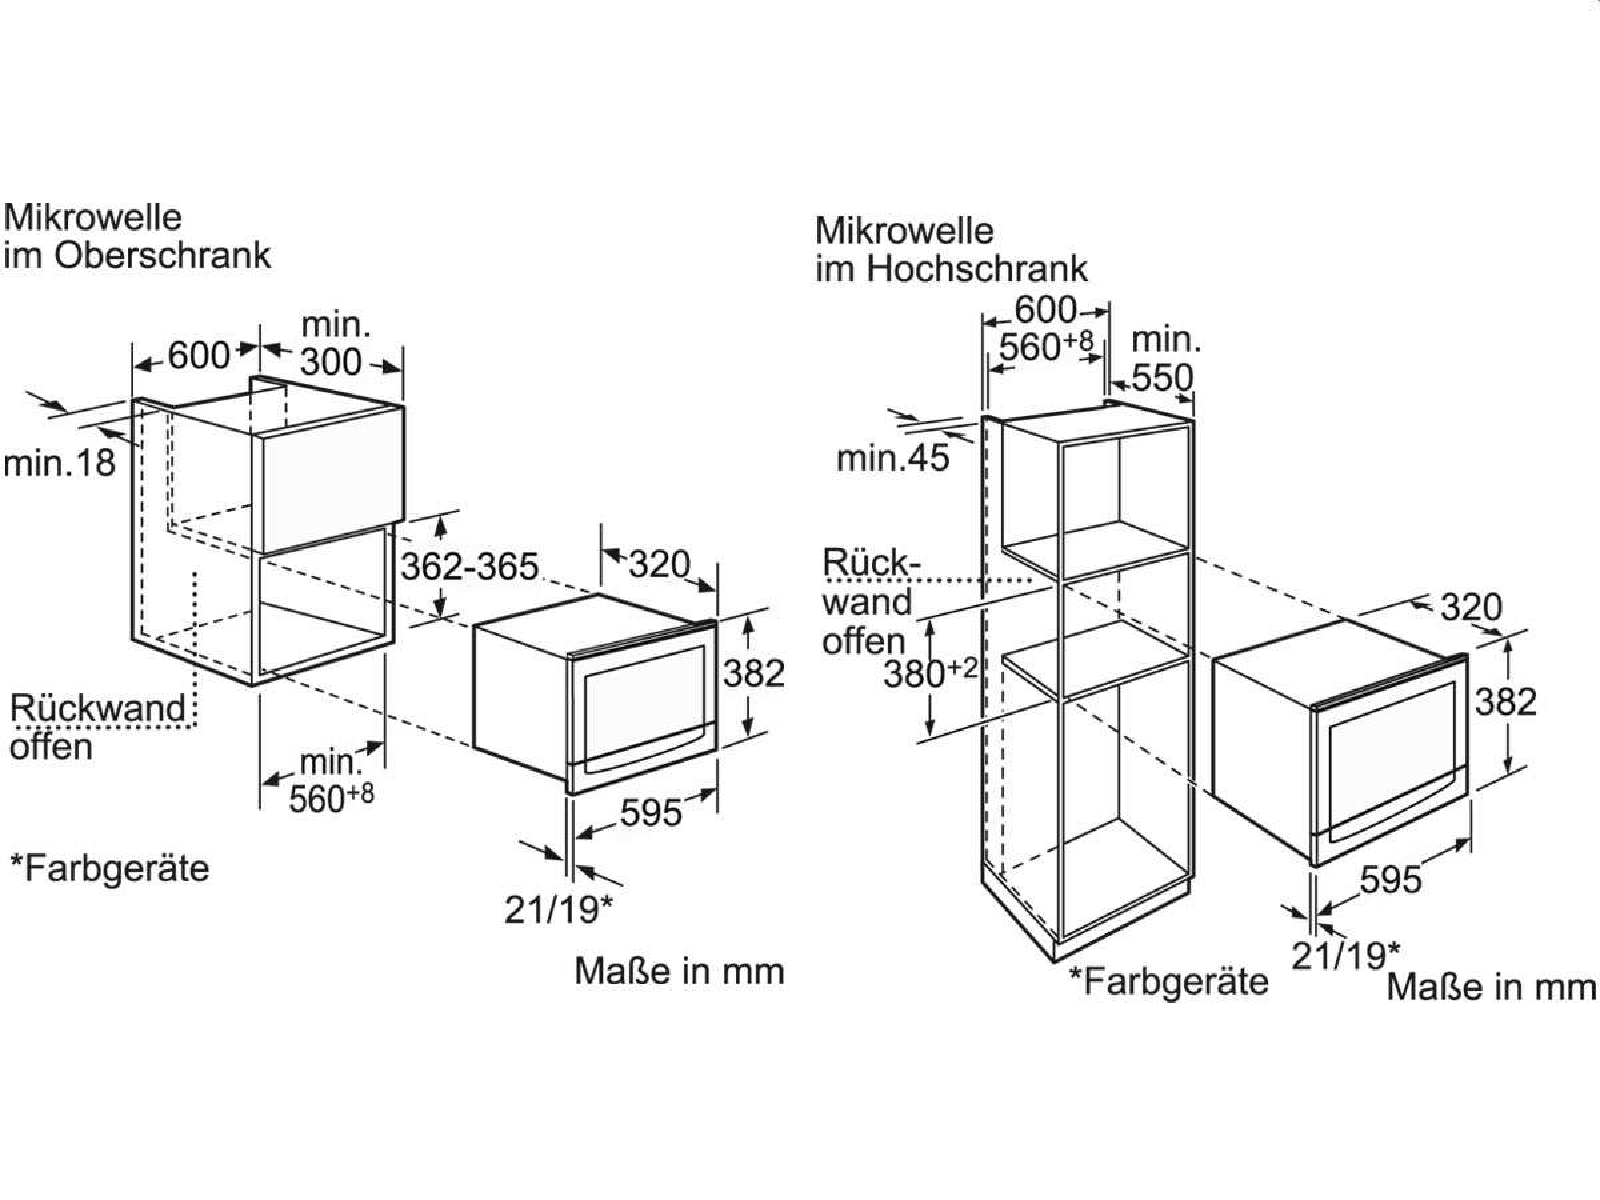 neff cl 5460 s einbau mikrowellenofen schwarz 900w 21 liter mikrowellenherd ebay. Black Bedroom Furniture Sets. Home Design Ideas